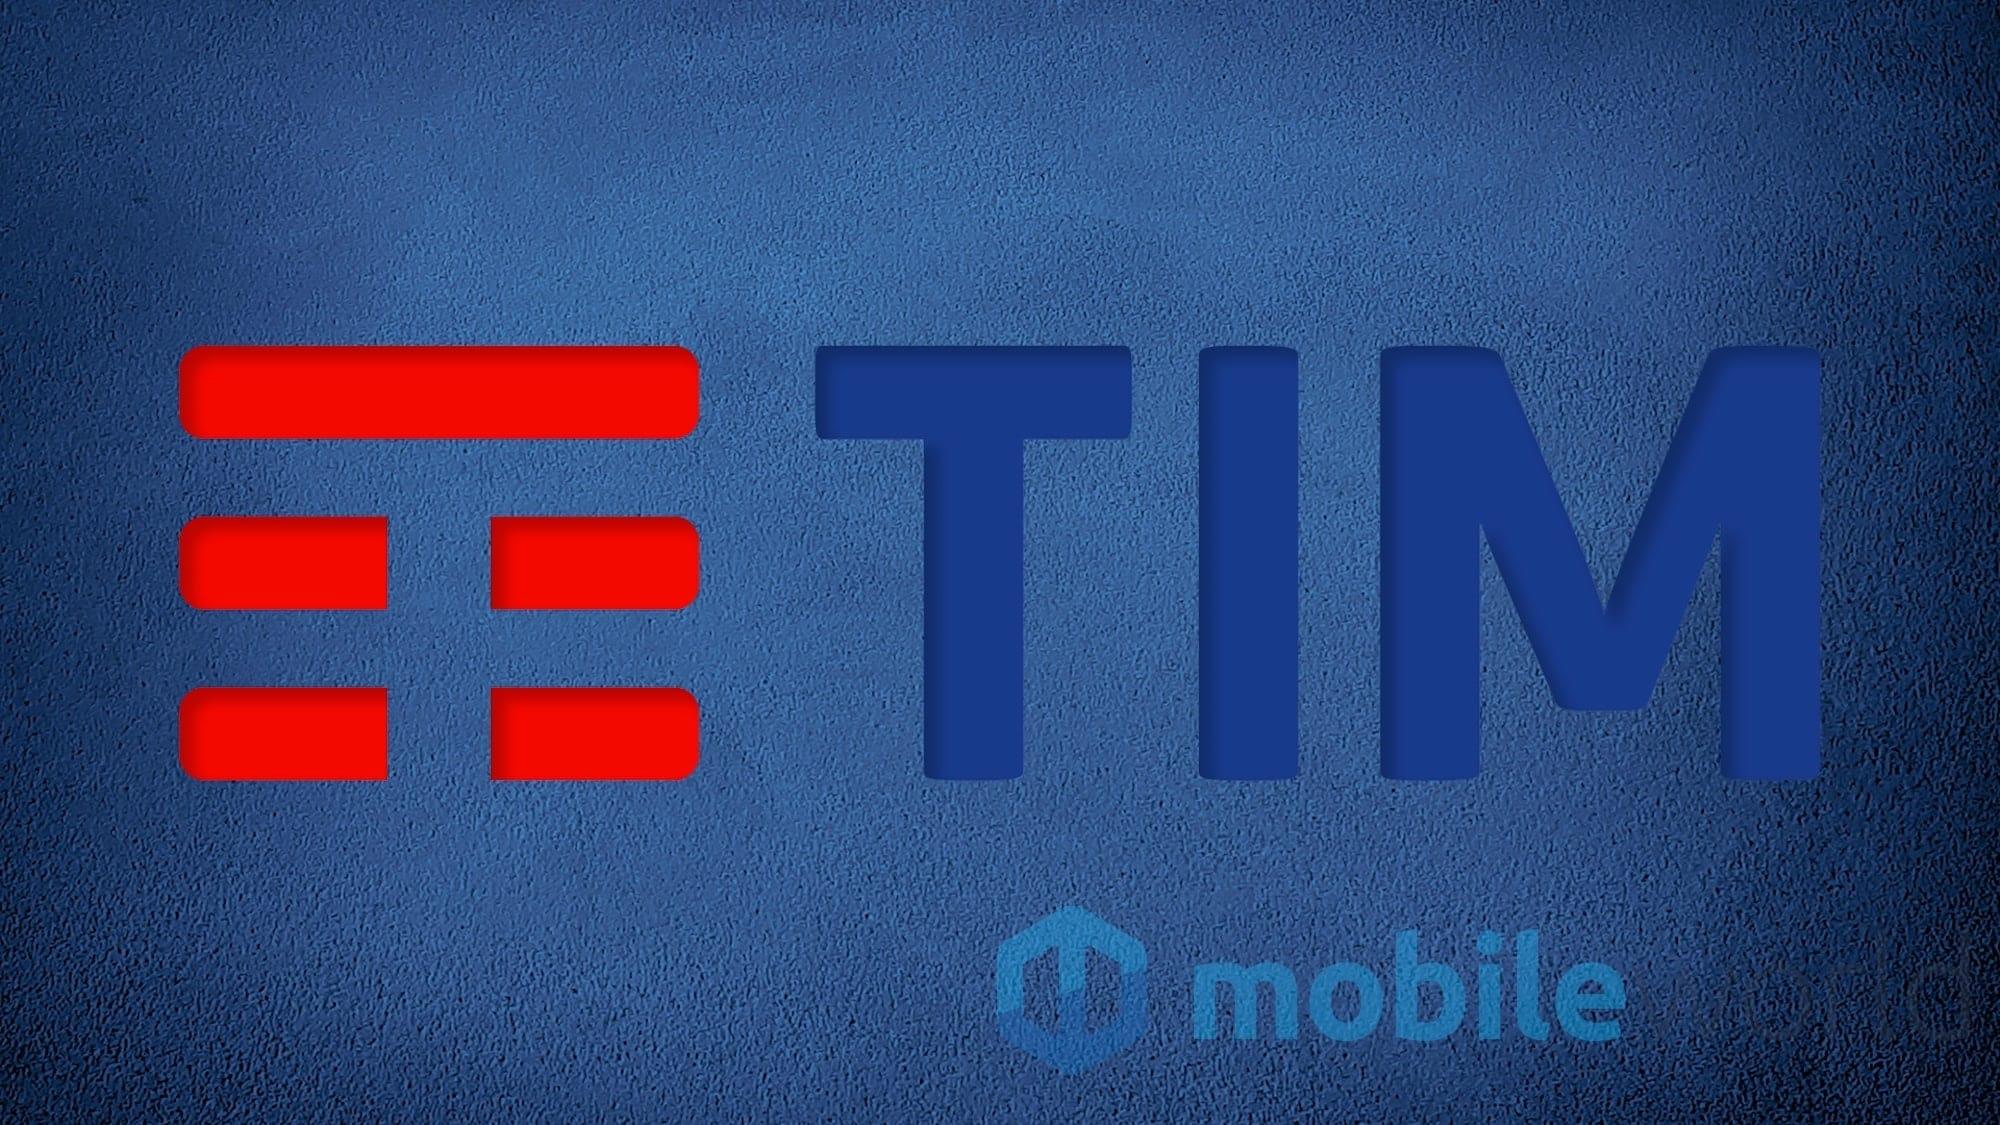 TIM e modem libero: ecco dove trovare i parametri VoIP nell'app TIM Modem (video)